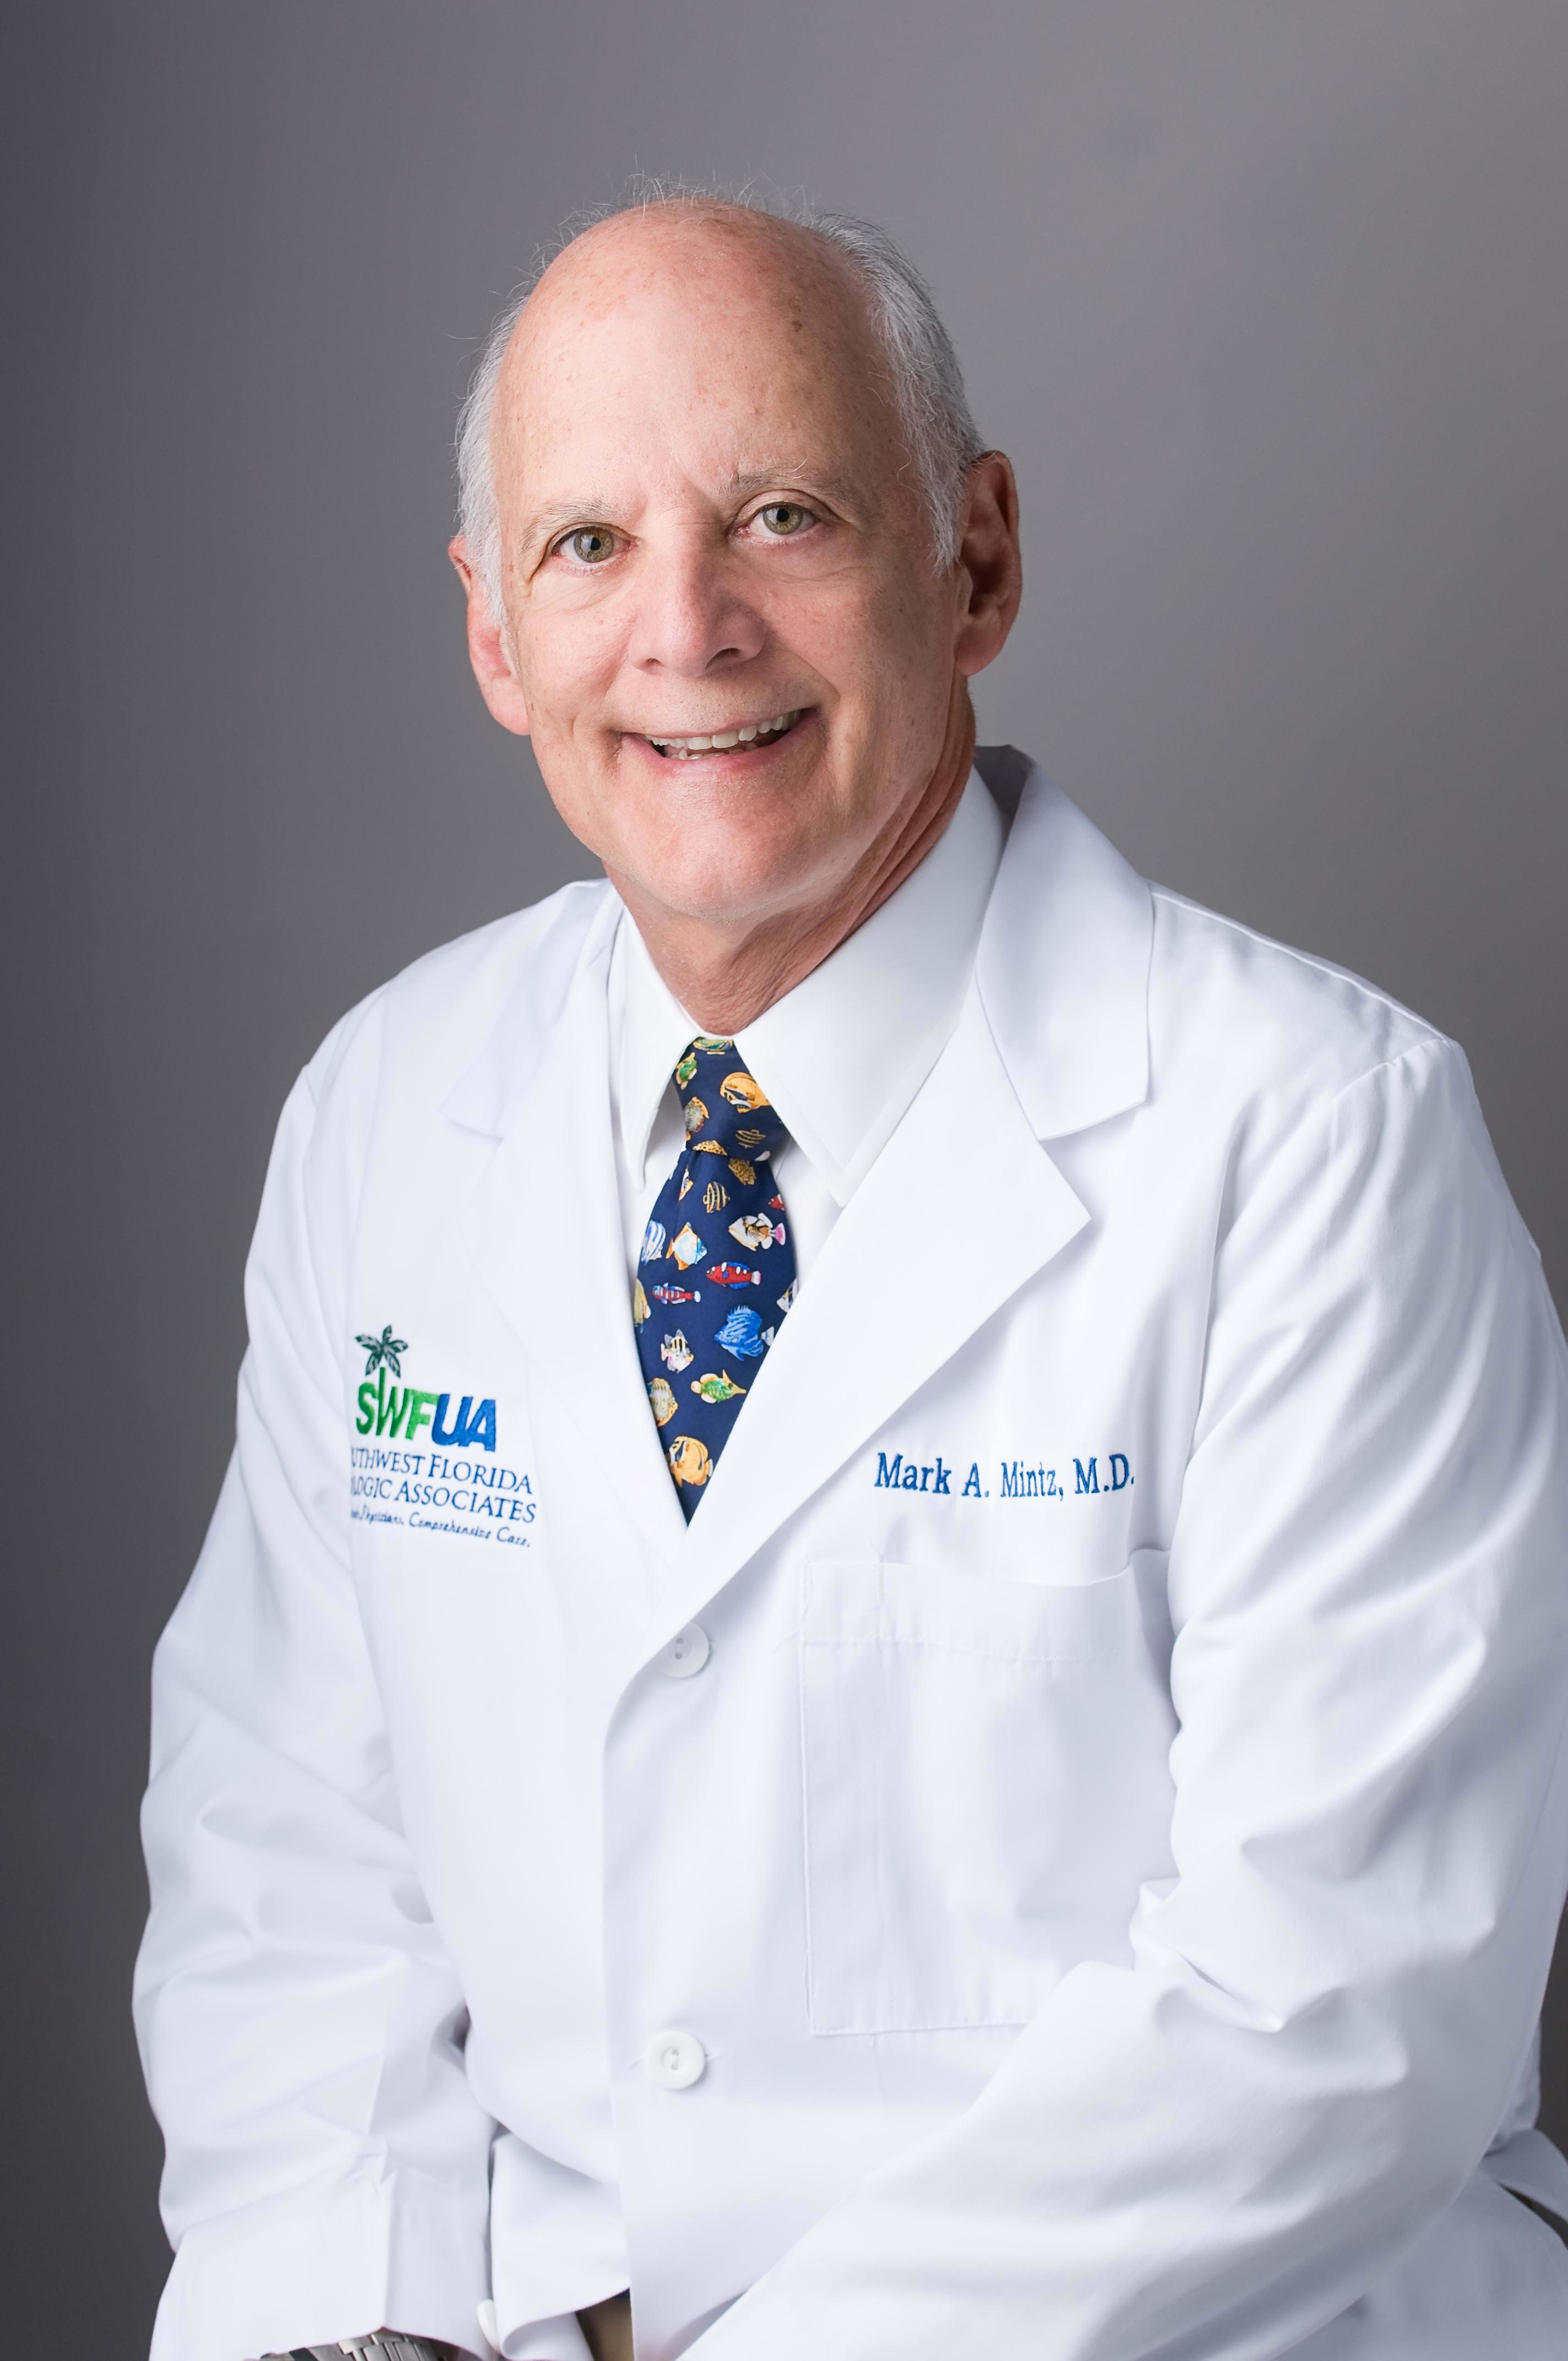 Dr. Mark A Mintz MD